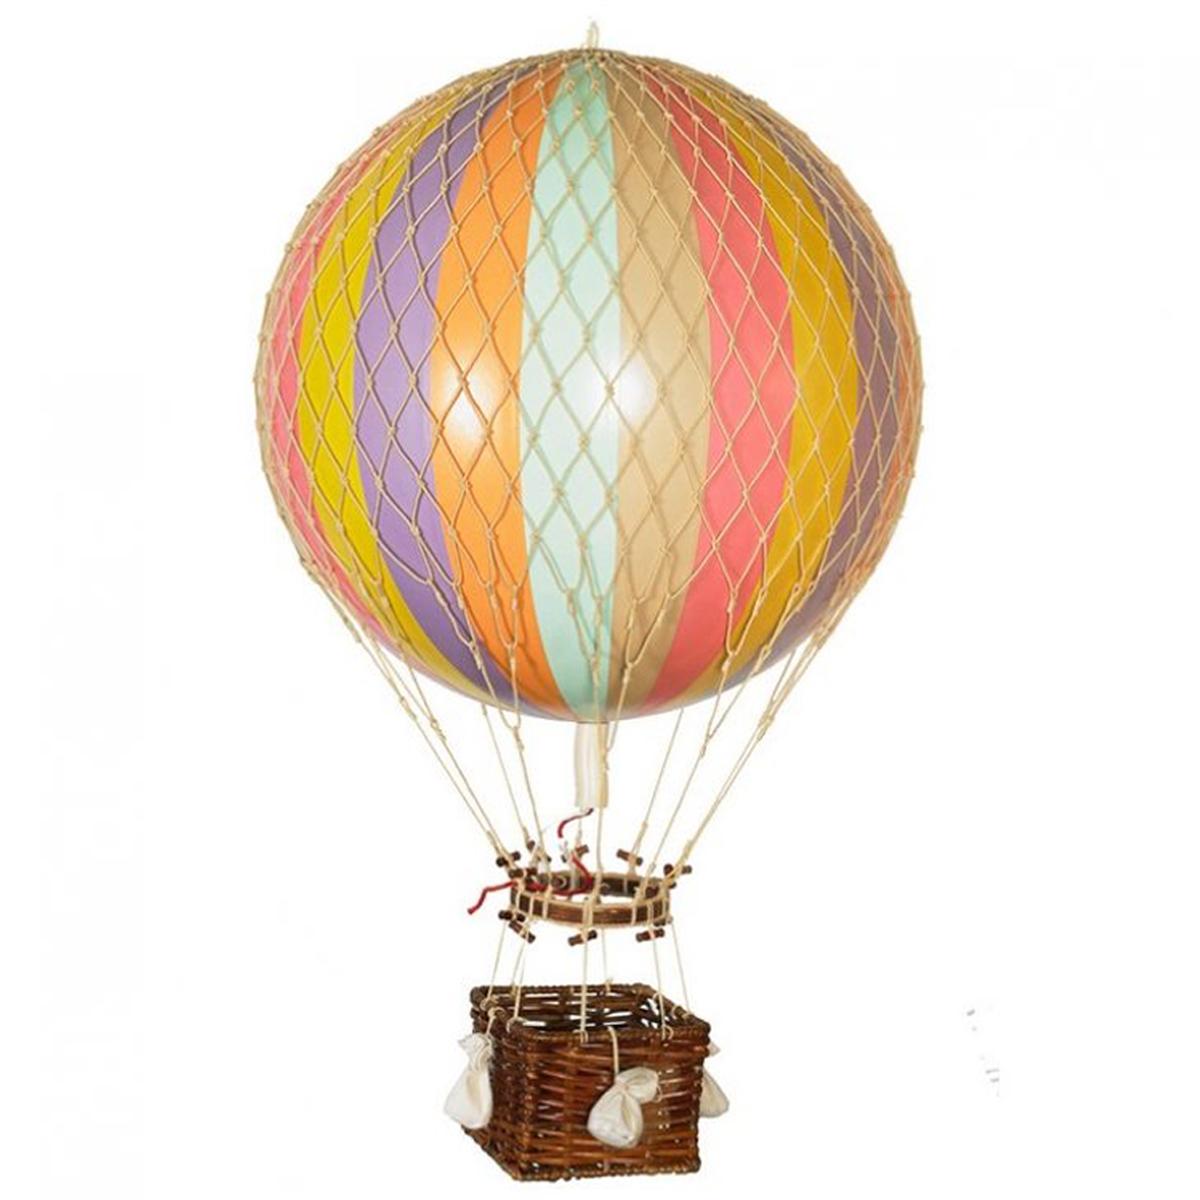 Image of Authentic Models luftballon 32 cm - pastel regnbue